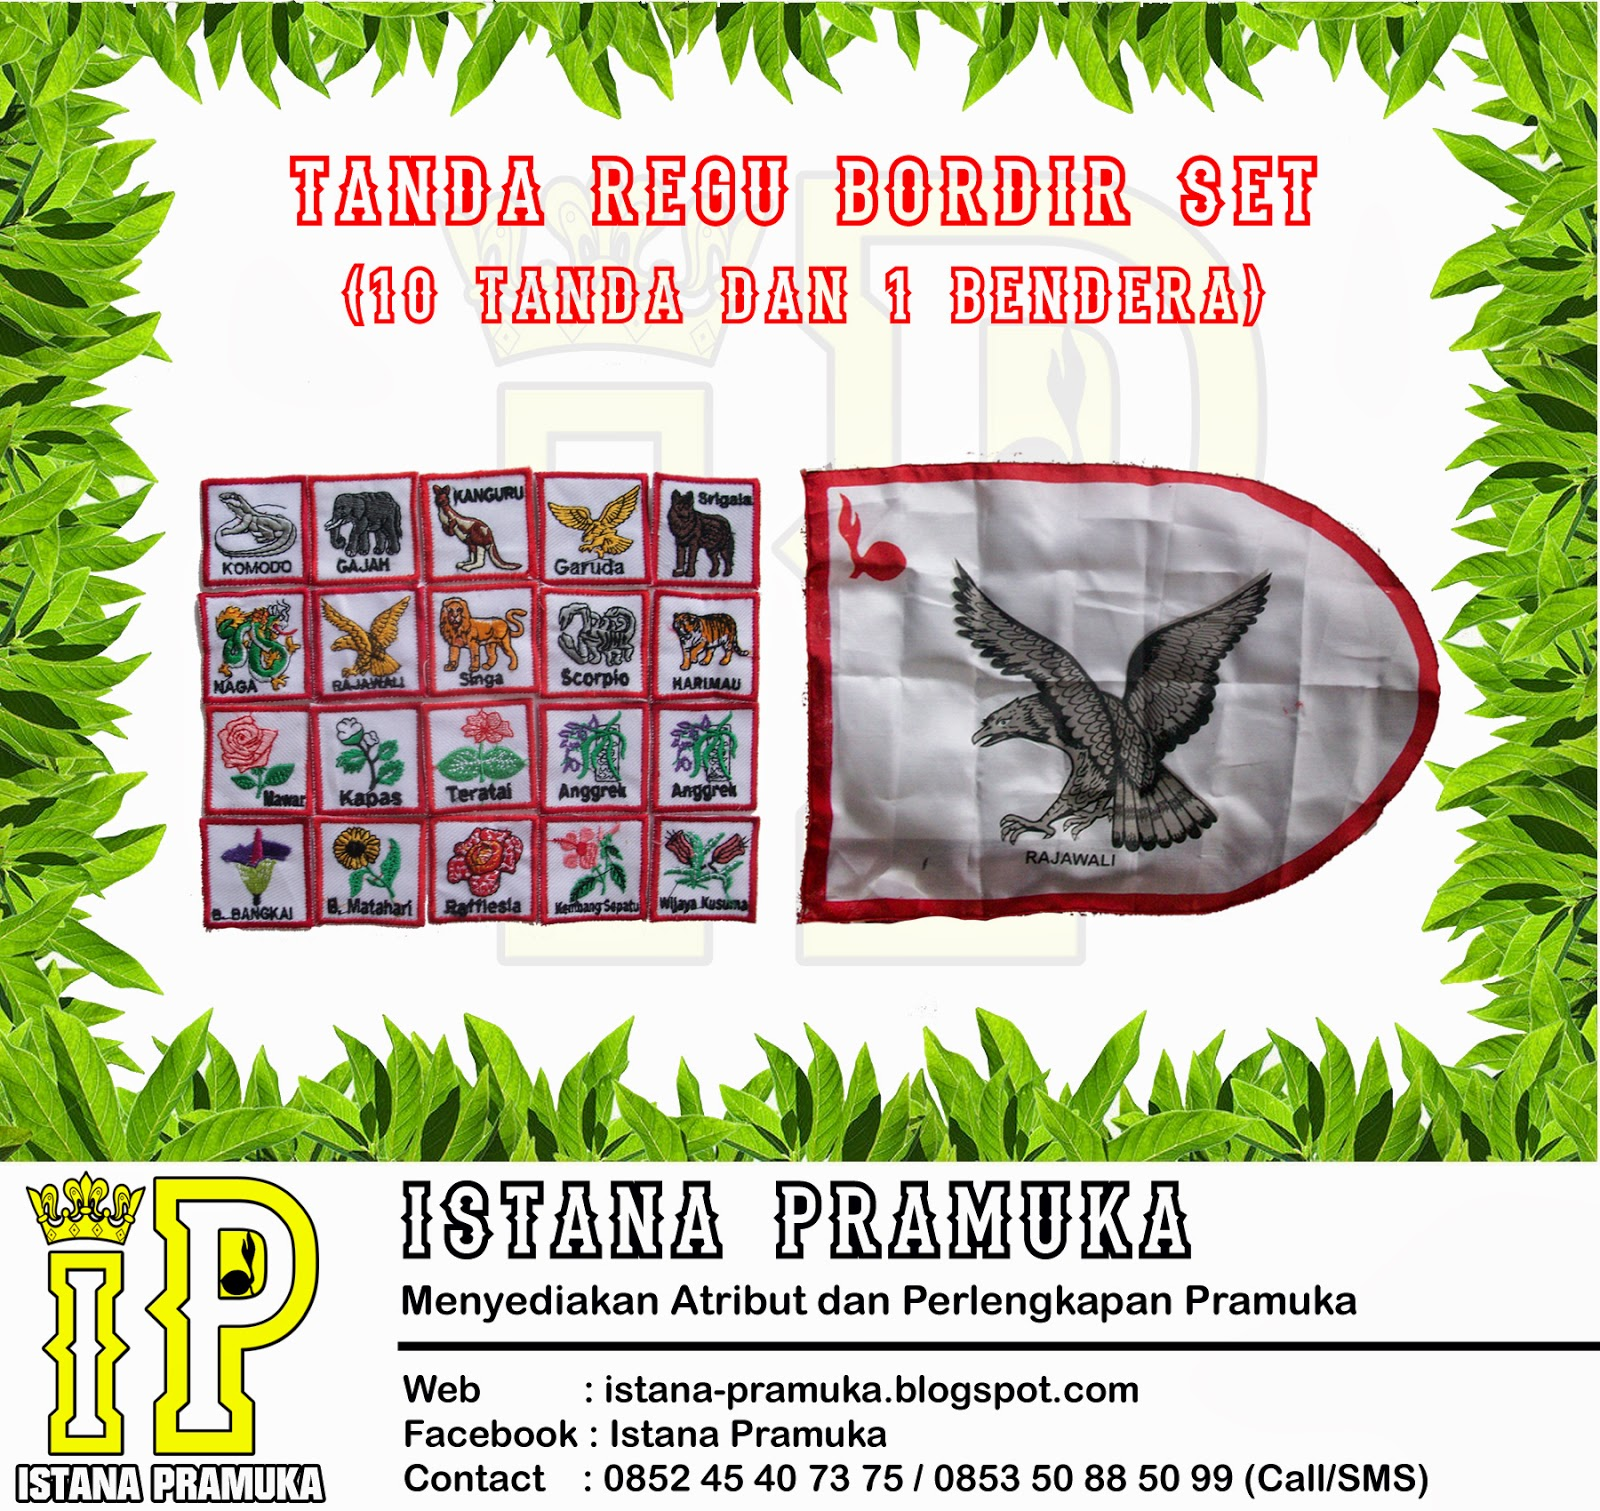 Istana Pramuka March 2014 Aneka Badge Regu Penggalang Produk Tanda Satuan